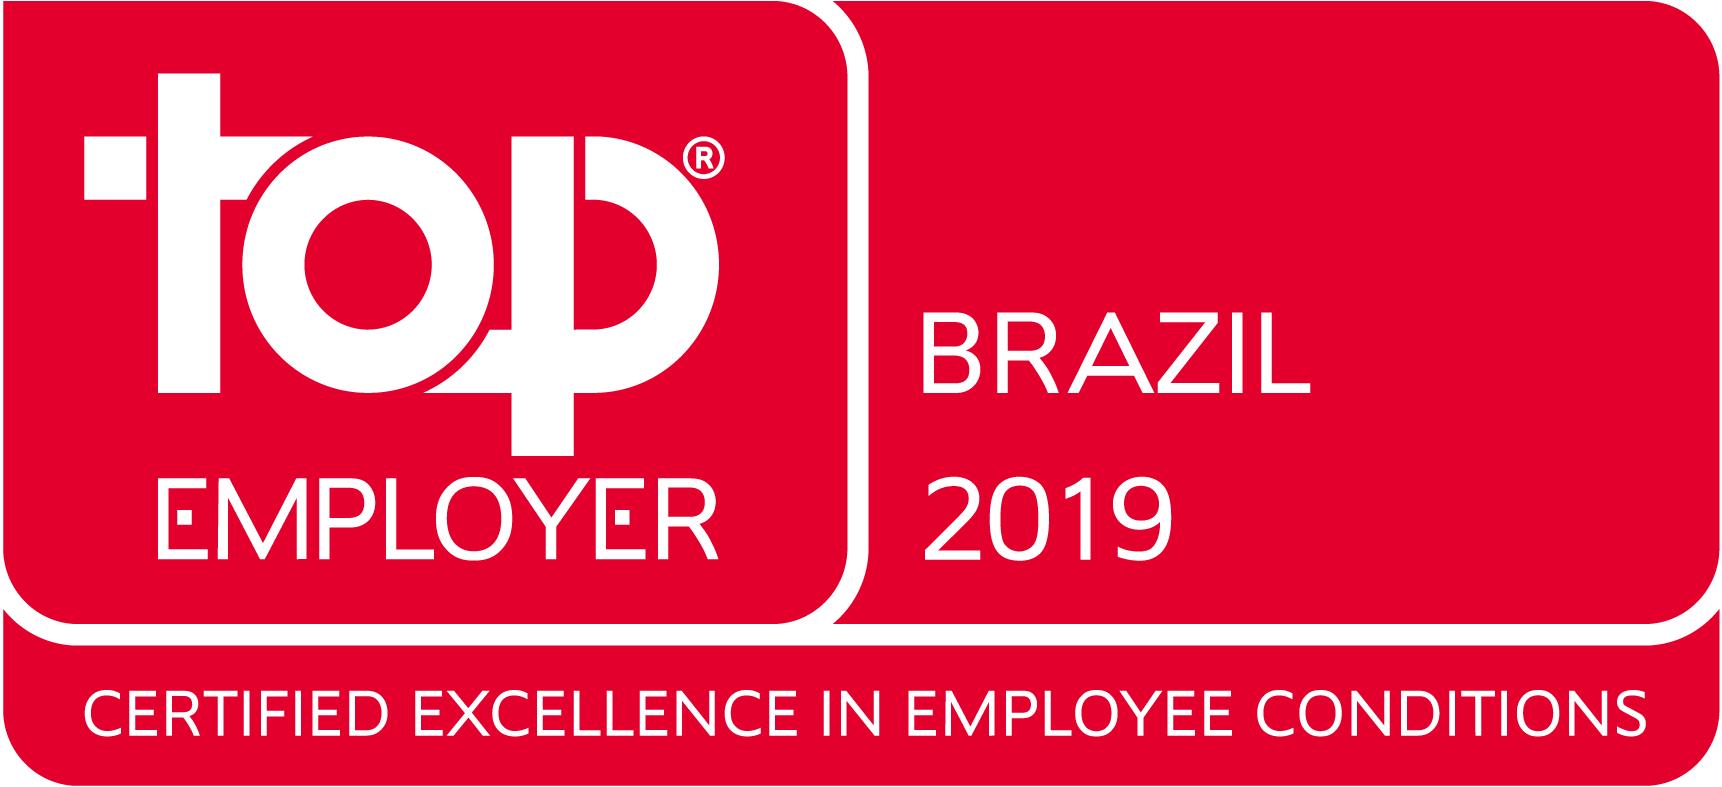 Top_Employer_Brazil_English_2019